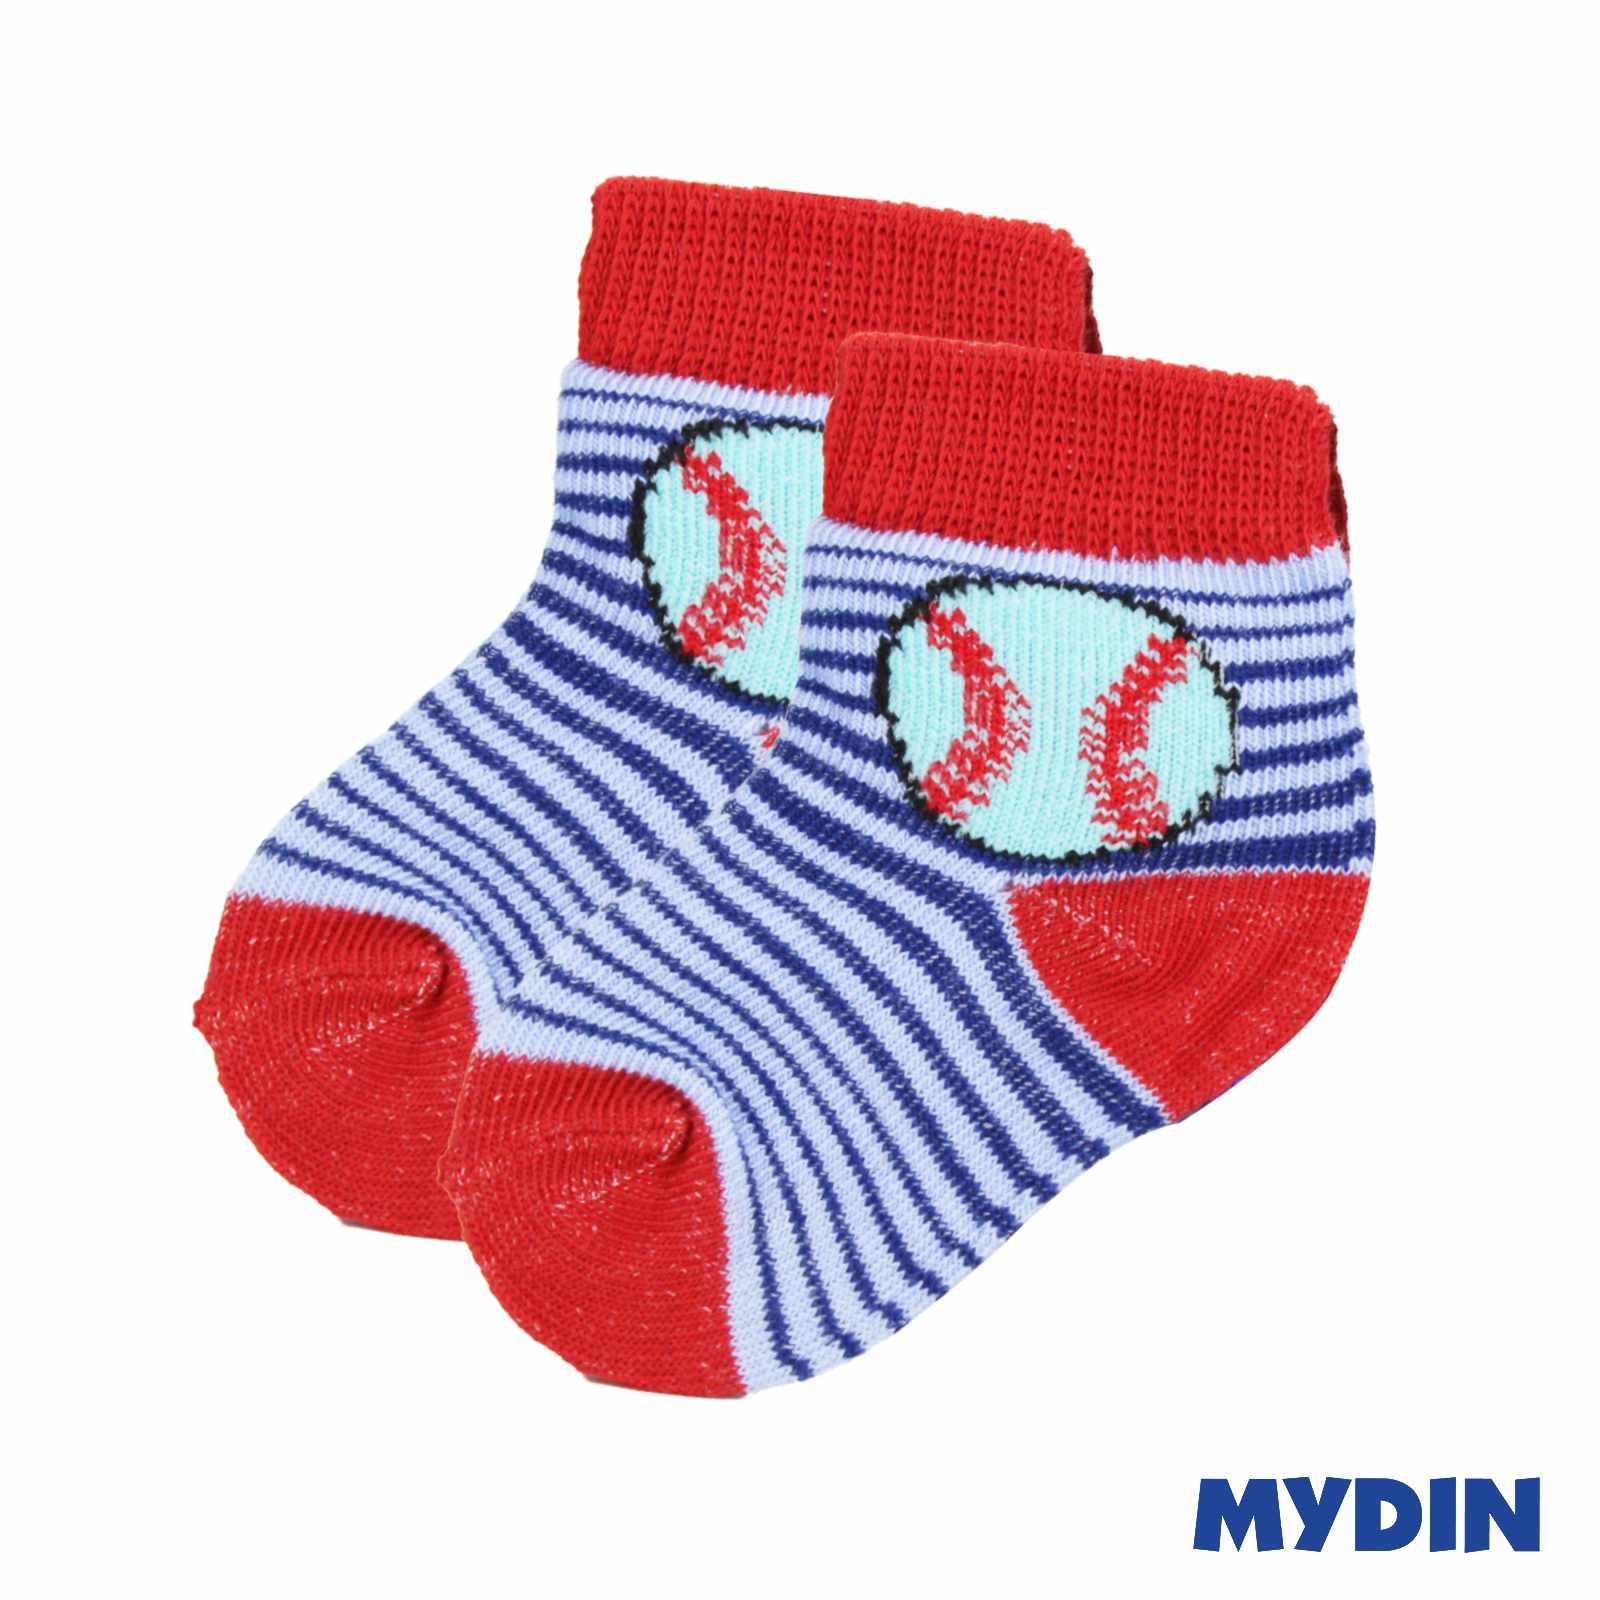 Ruerbear Baby Socks 3 Pair (0-6m) 1219WBRBBE01B